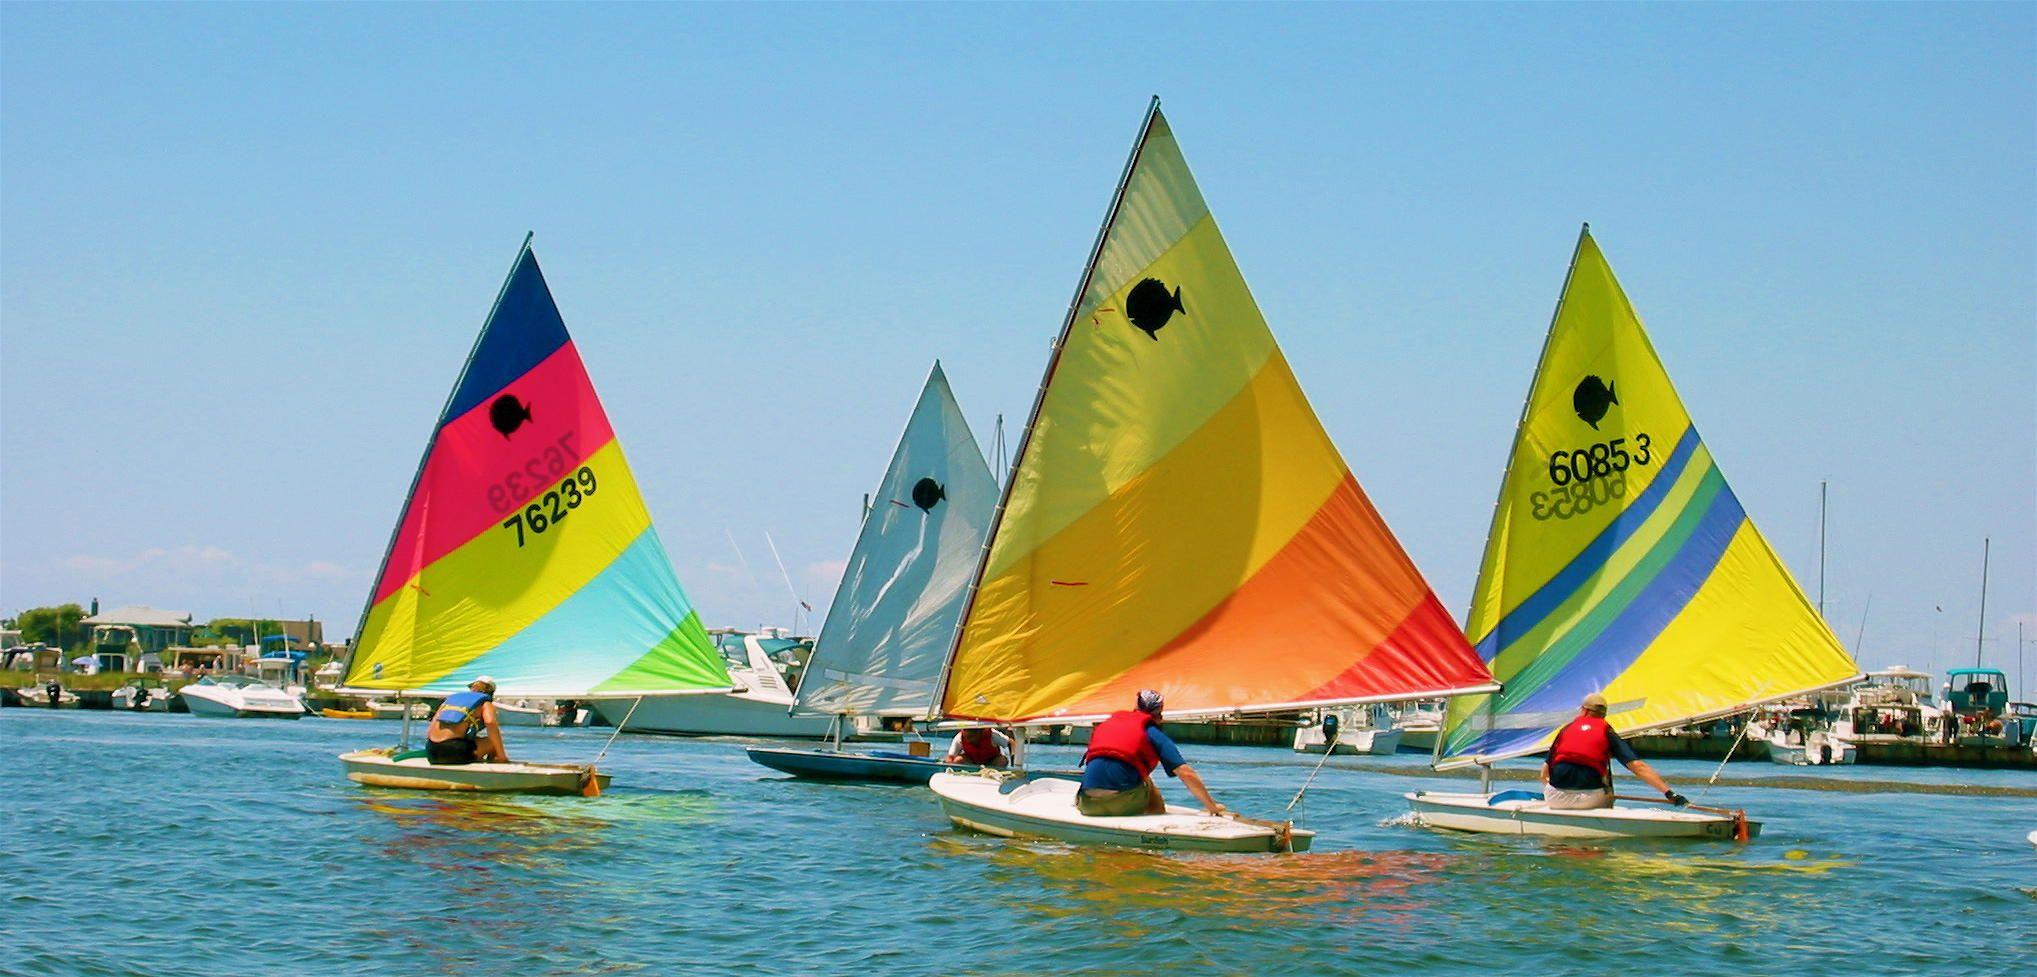 Image detail for -sunfish sailboats colorful ocean sailboats